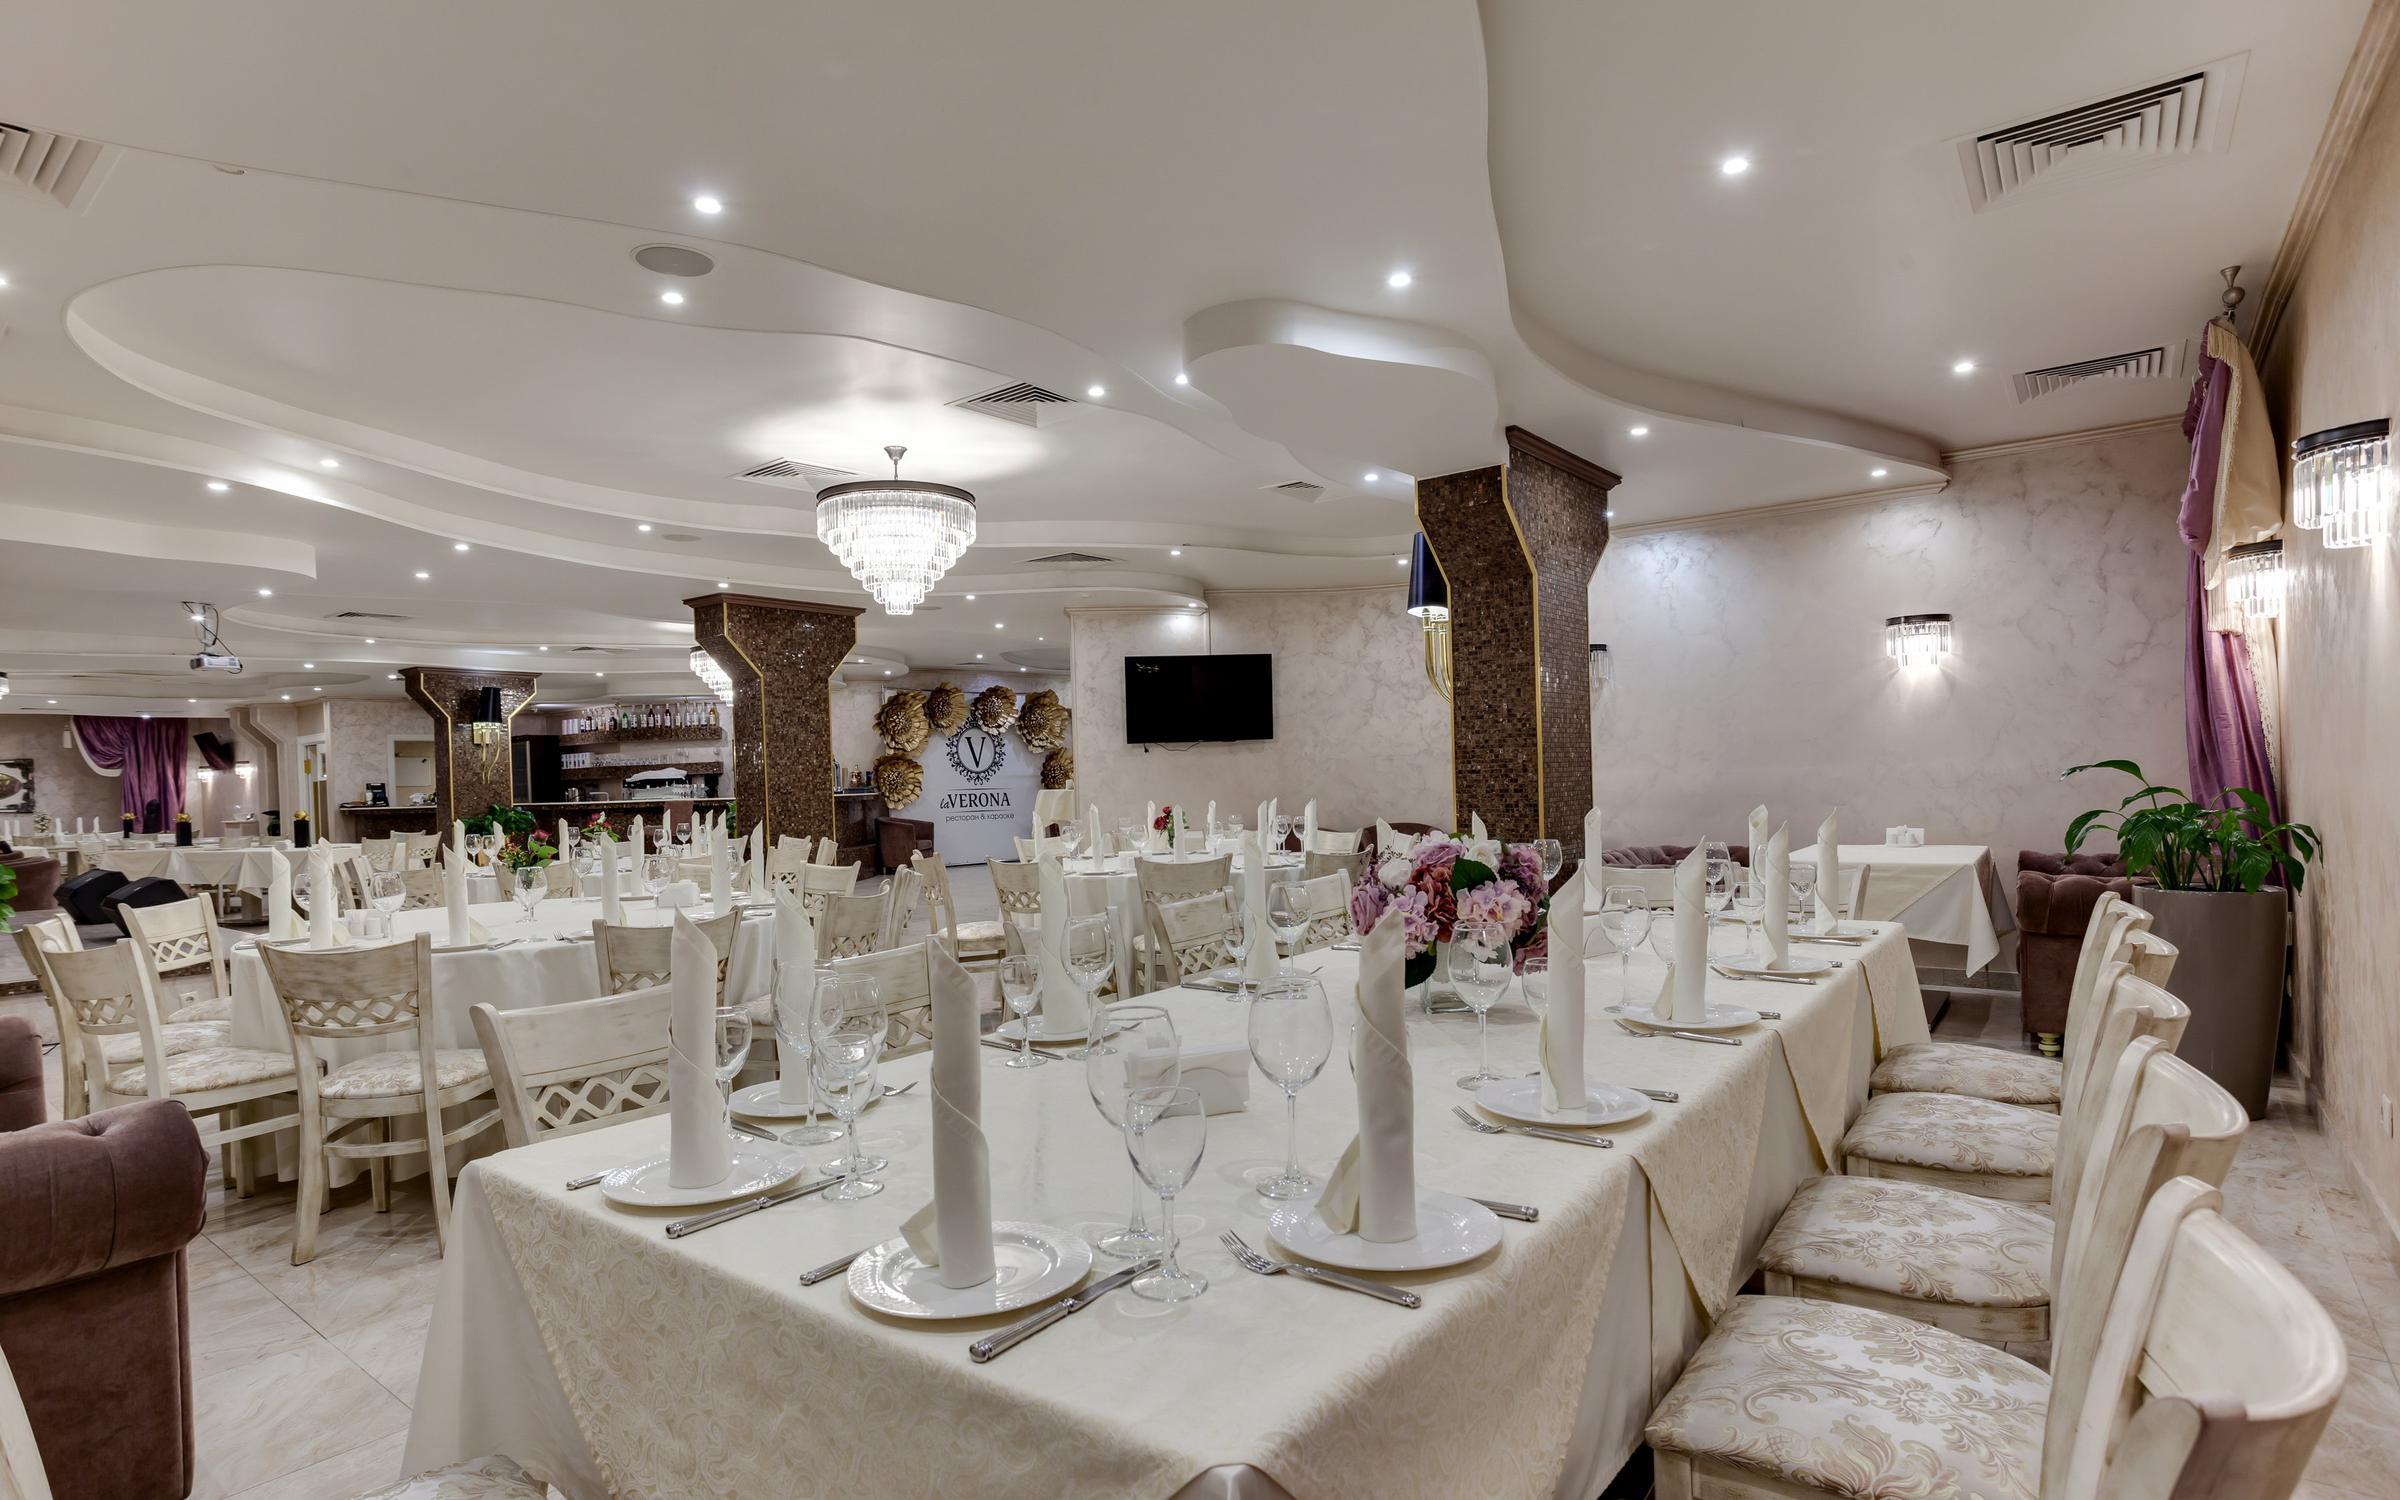 фотография Ресторана-караоке La Verona на улице Россолимо